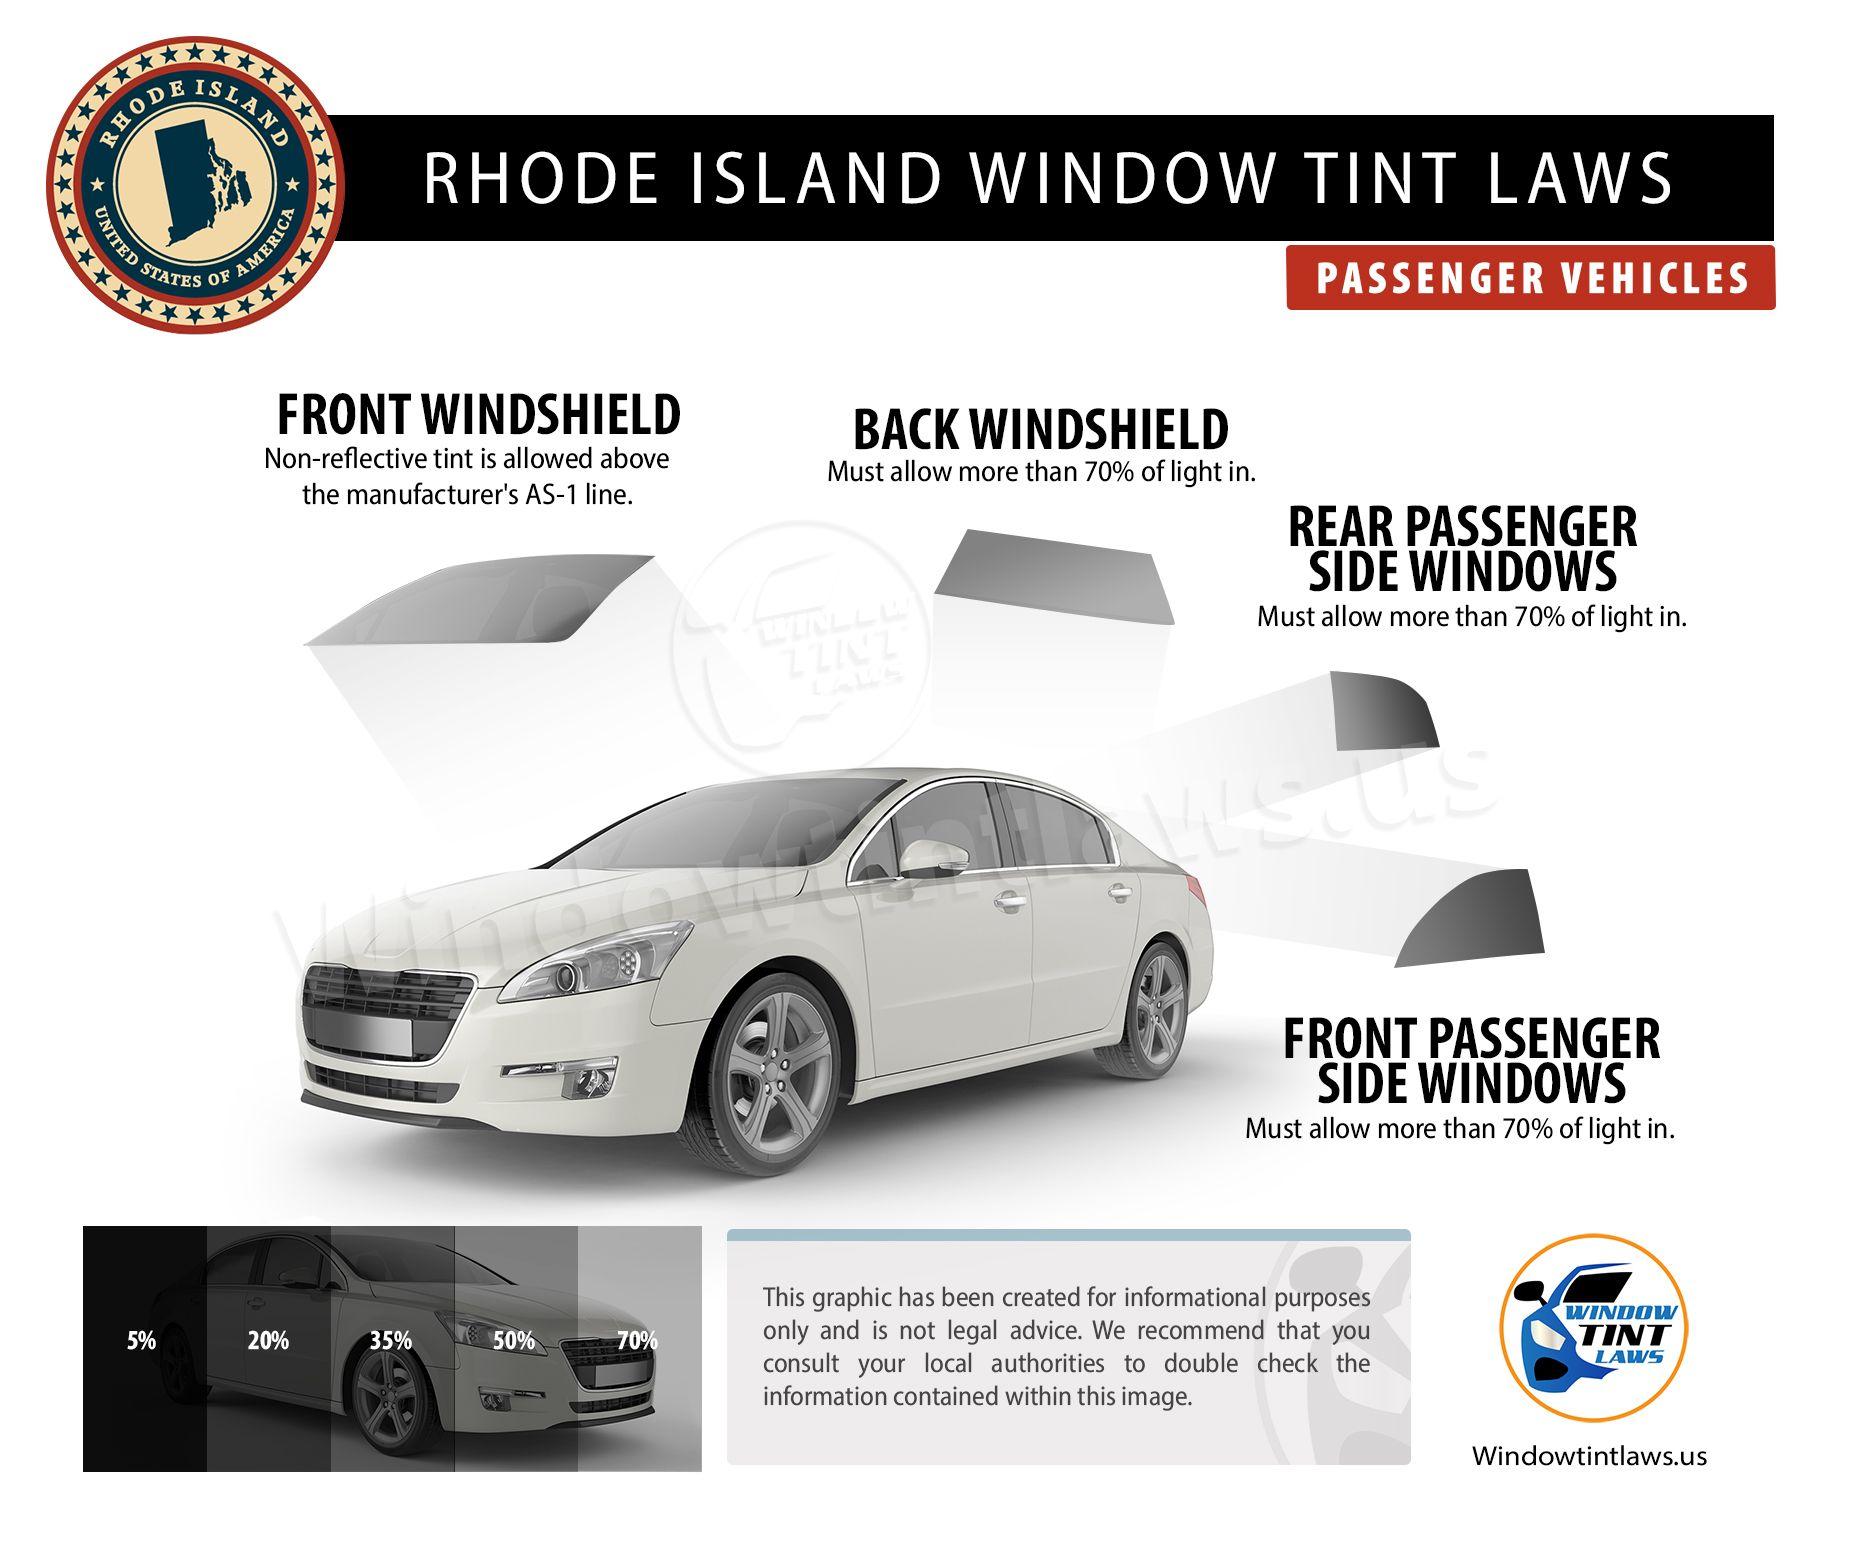 Rhode Island Window Tint Laws 2020 Explained Windowtintlaws Us